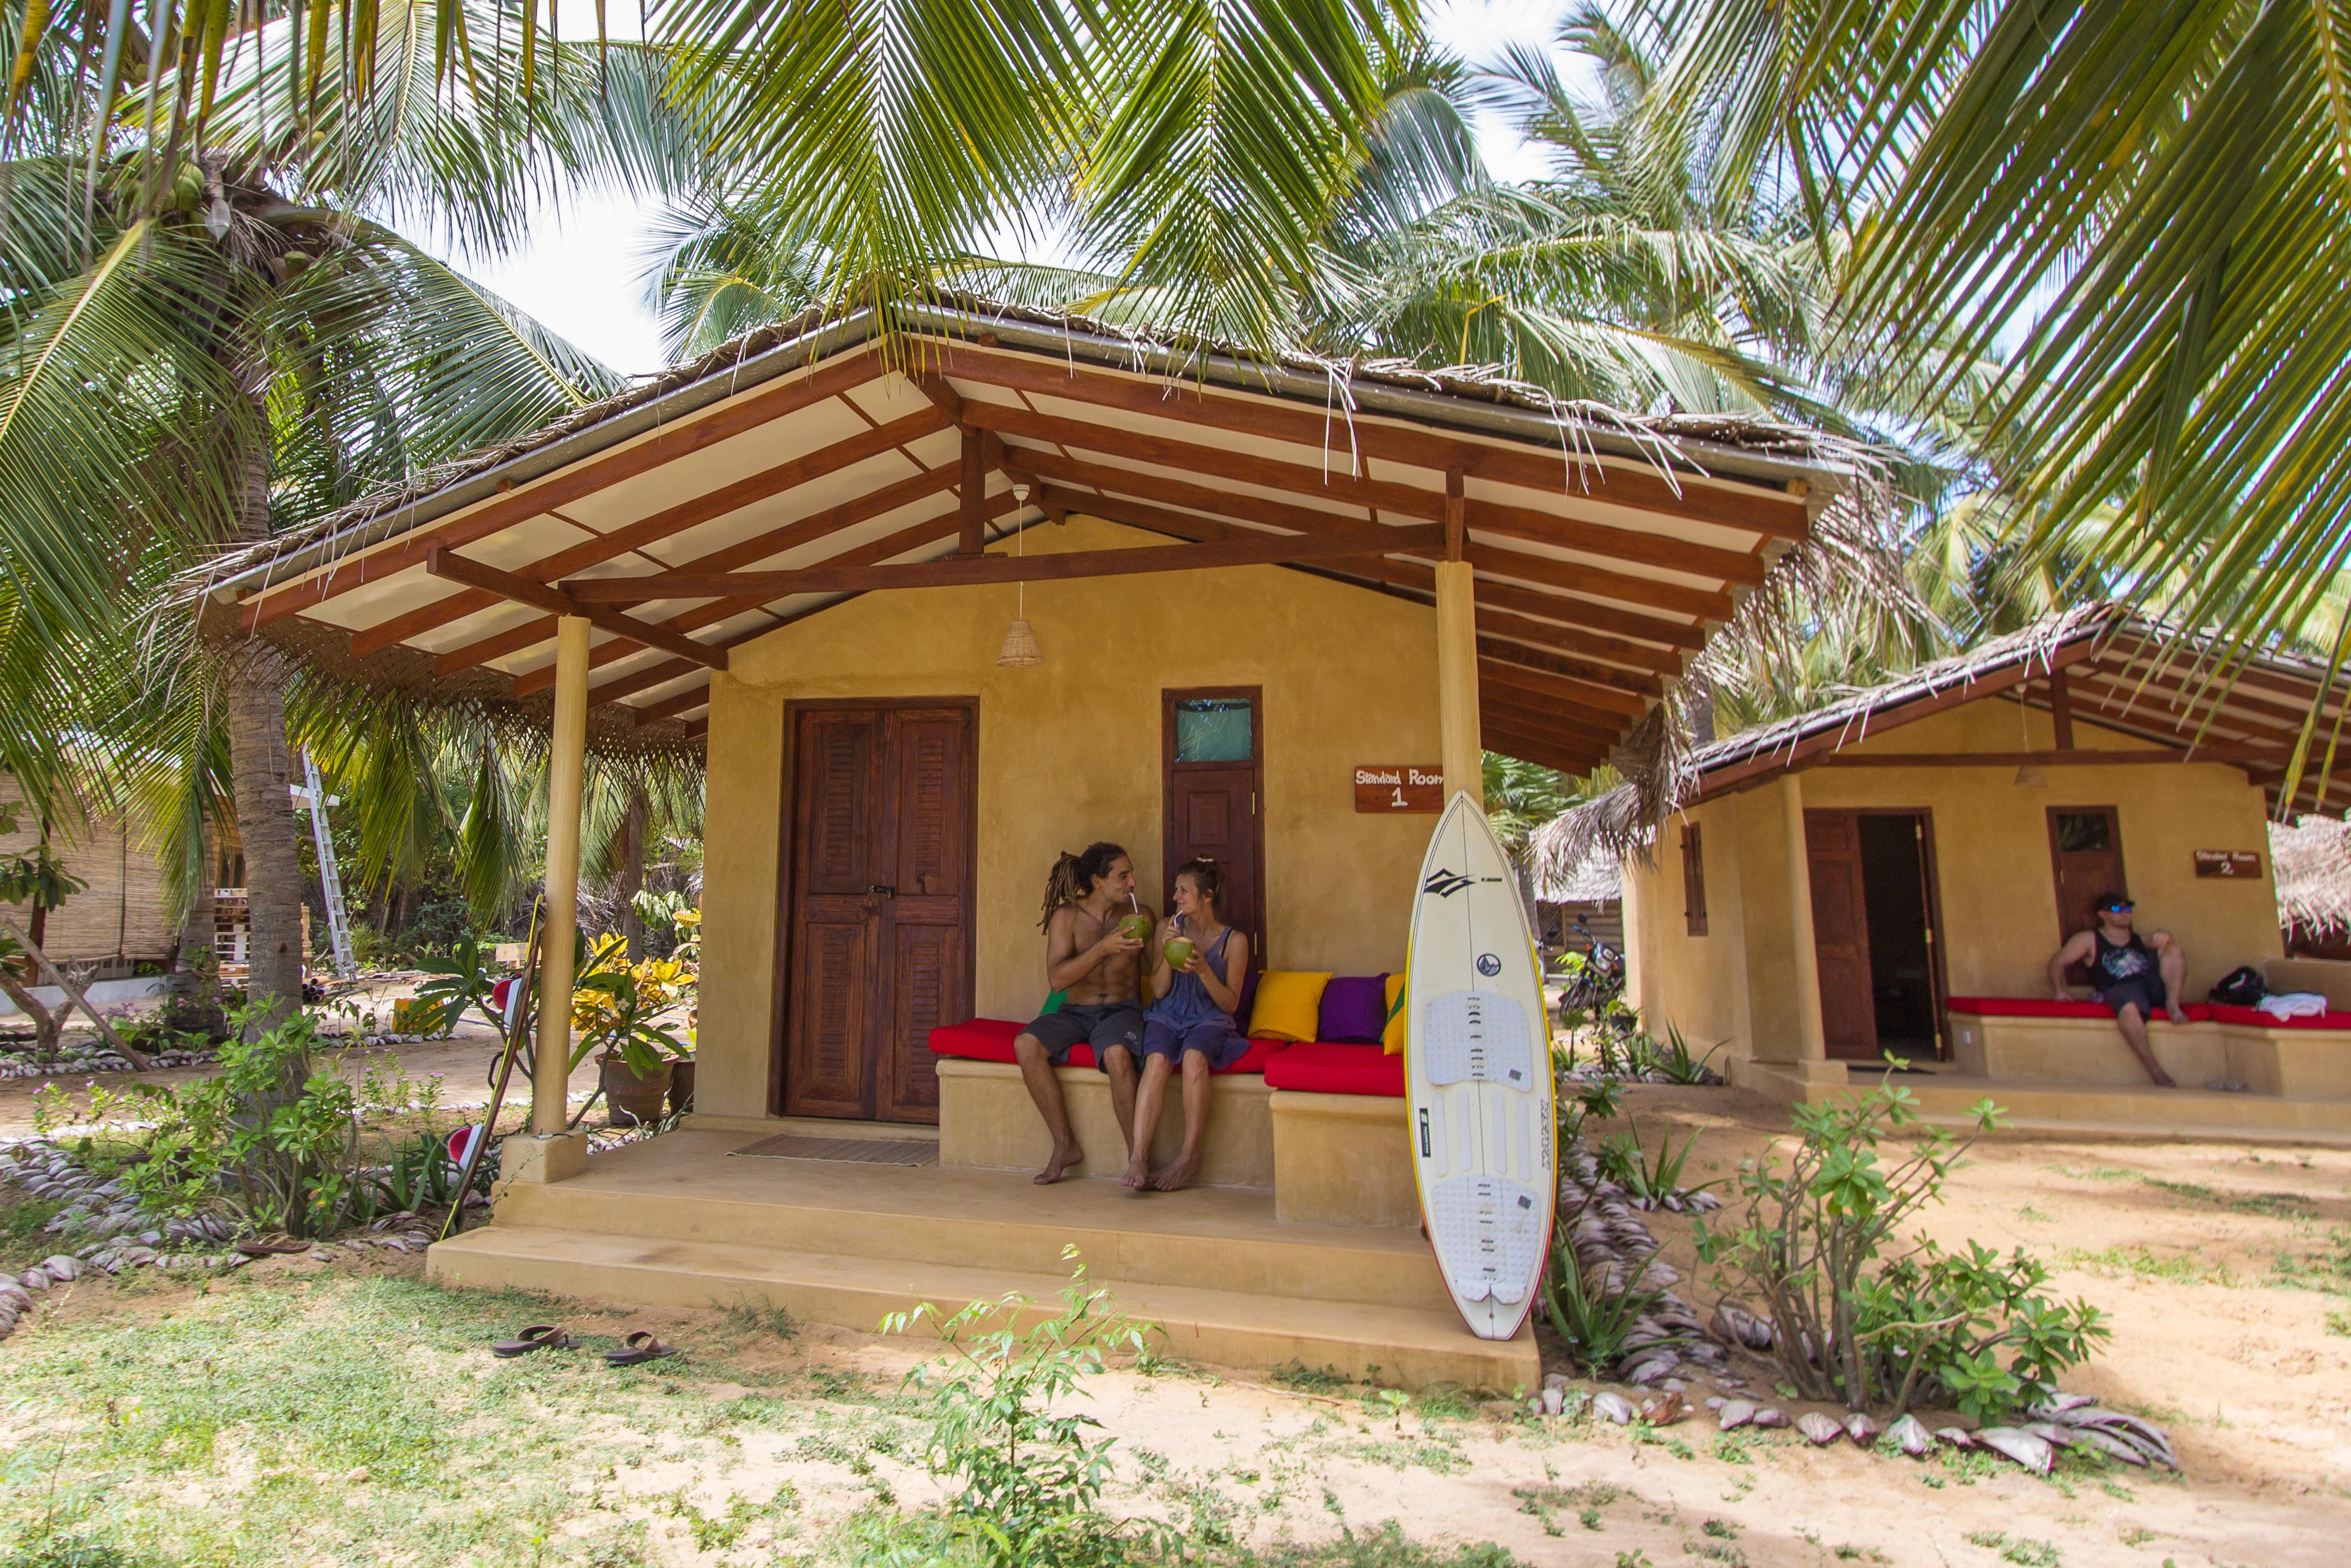 Kitesurfing Lanka - Bung. Standard